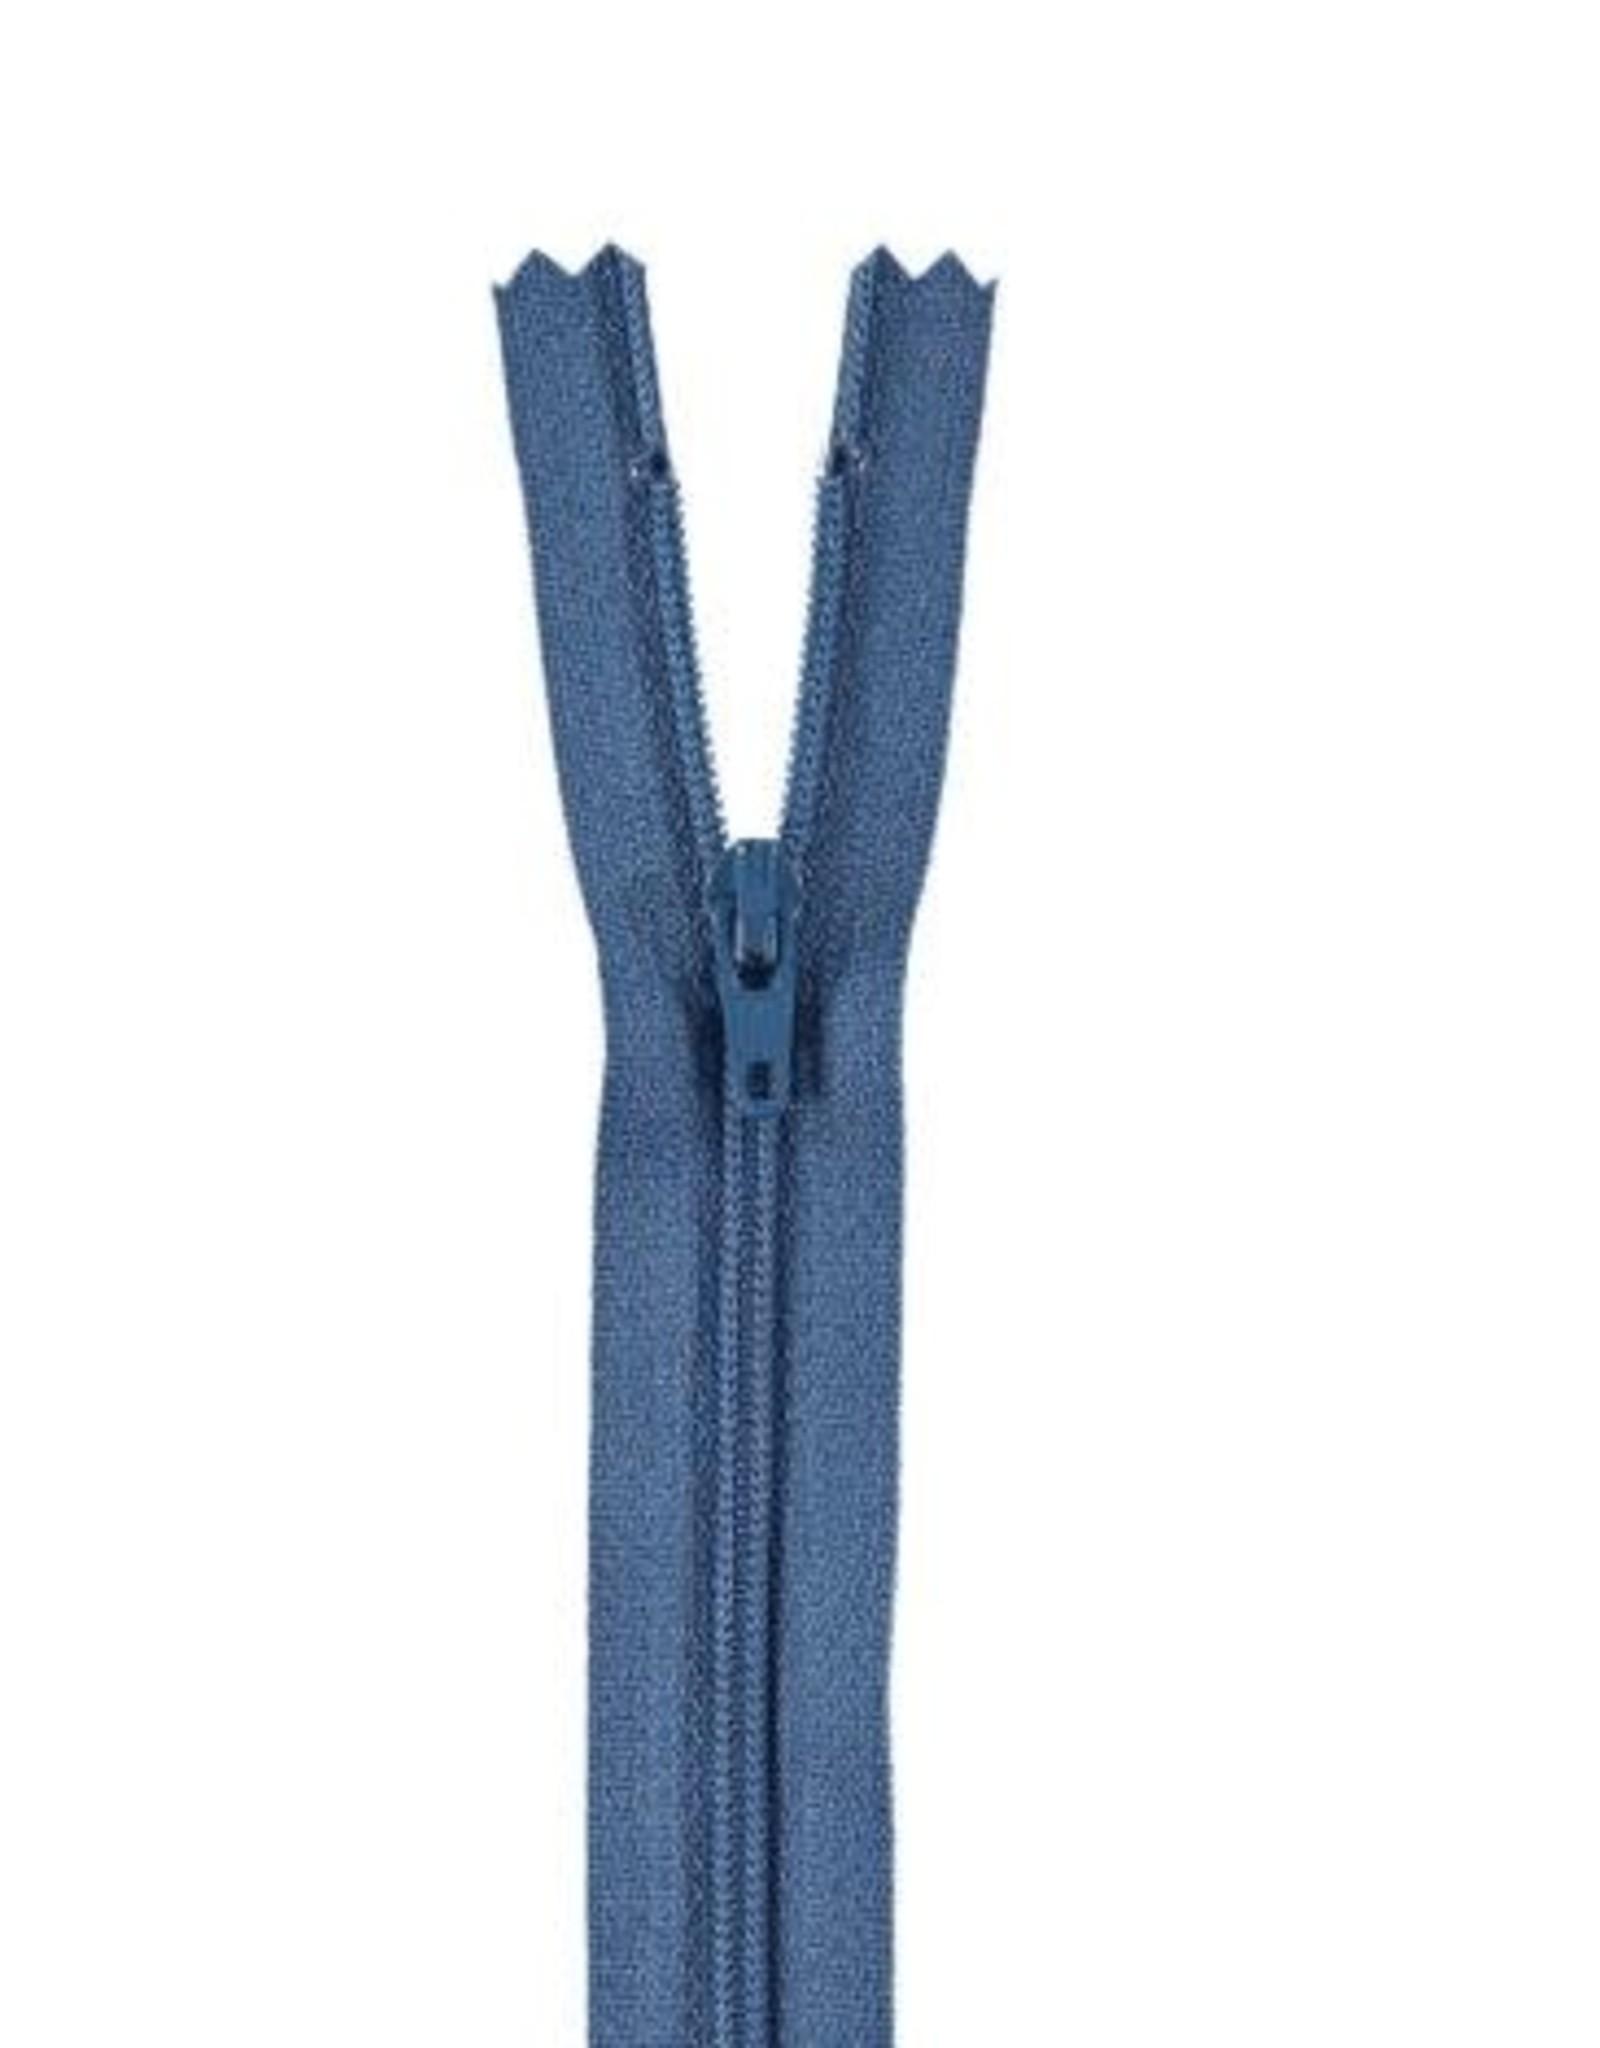 YKK Spiraalrits niet-DB 3mm jeansblauw 839-40cm